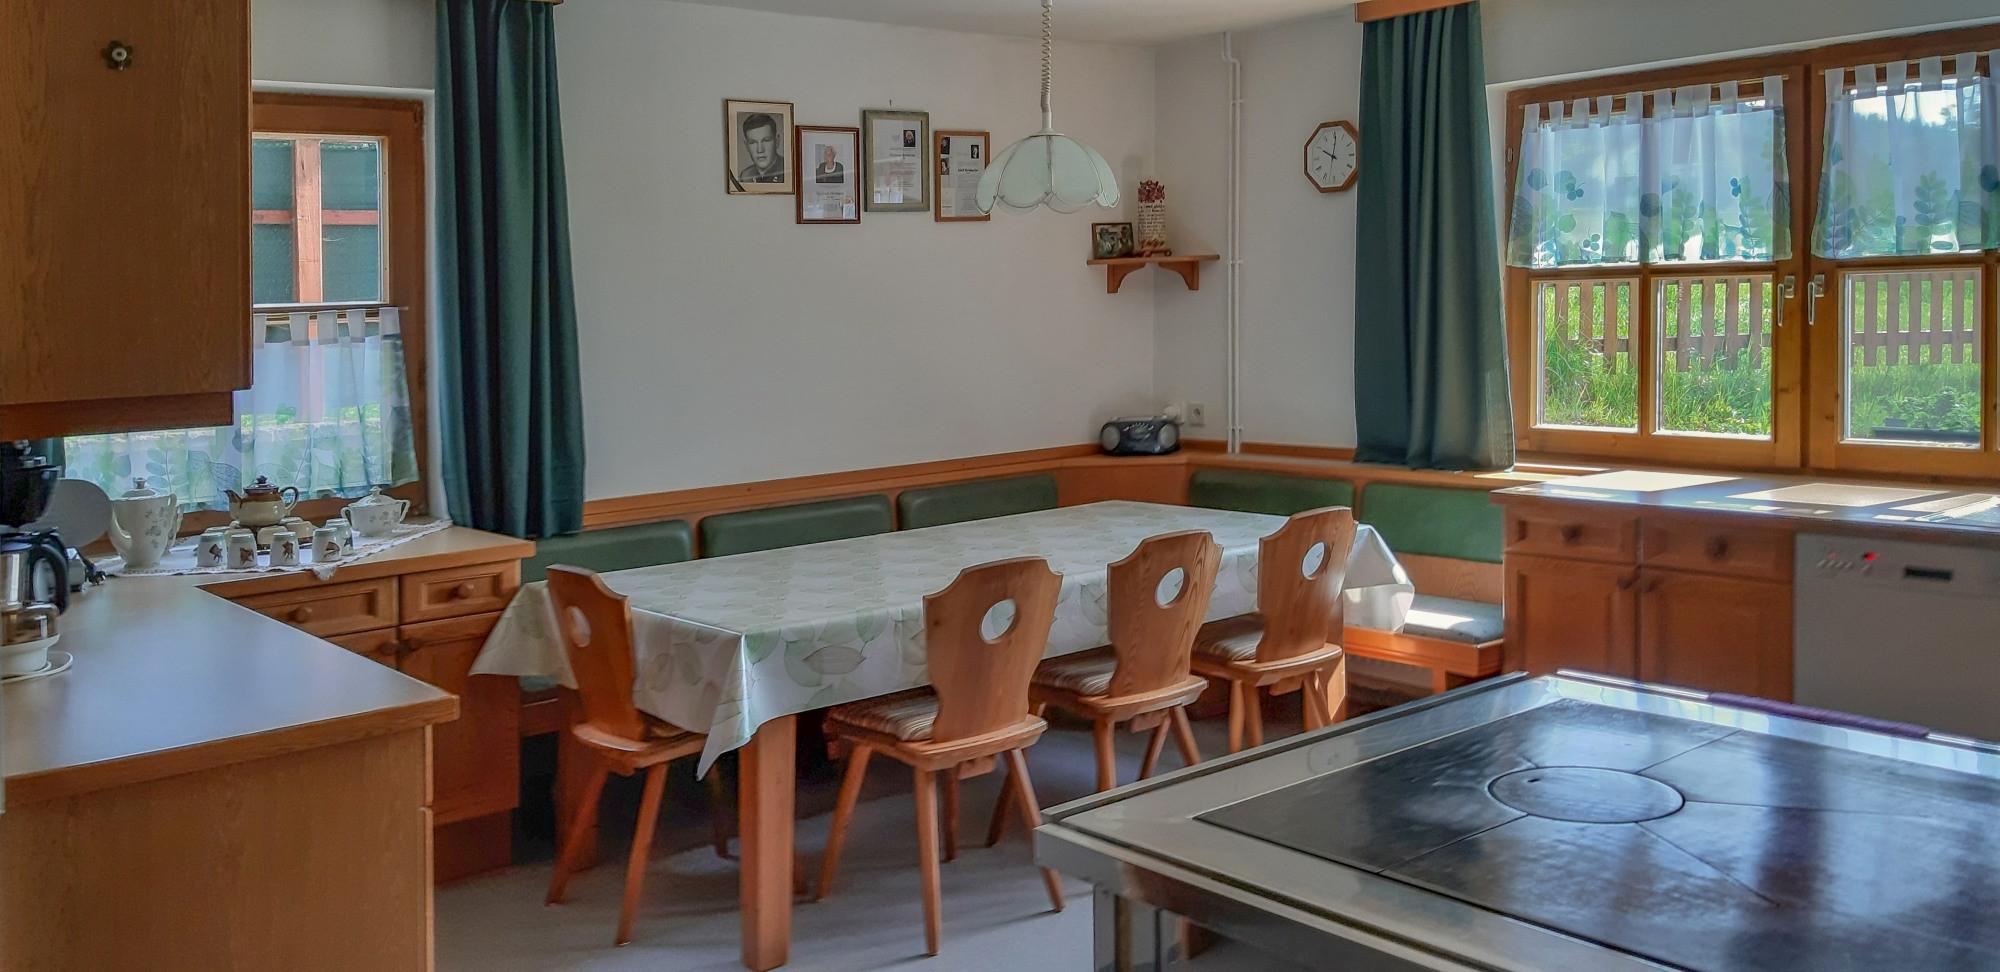 Kueche Bauernhaus 1.jpg